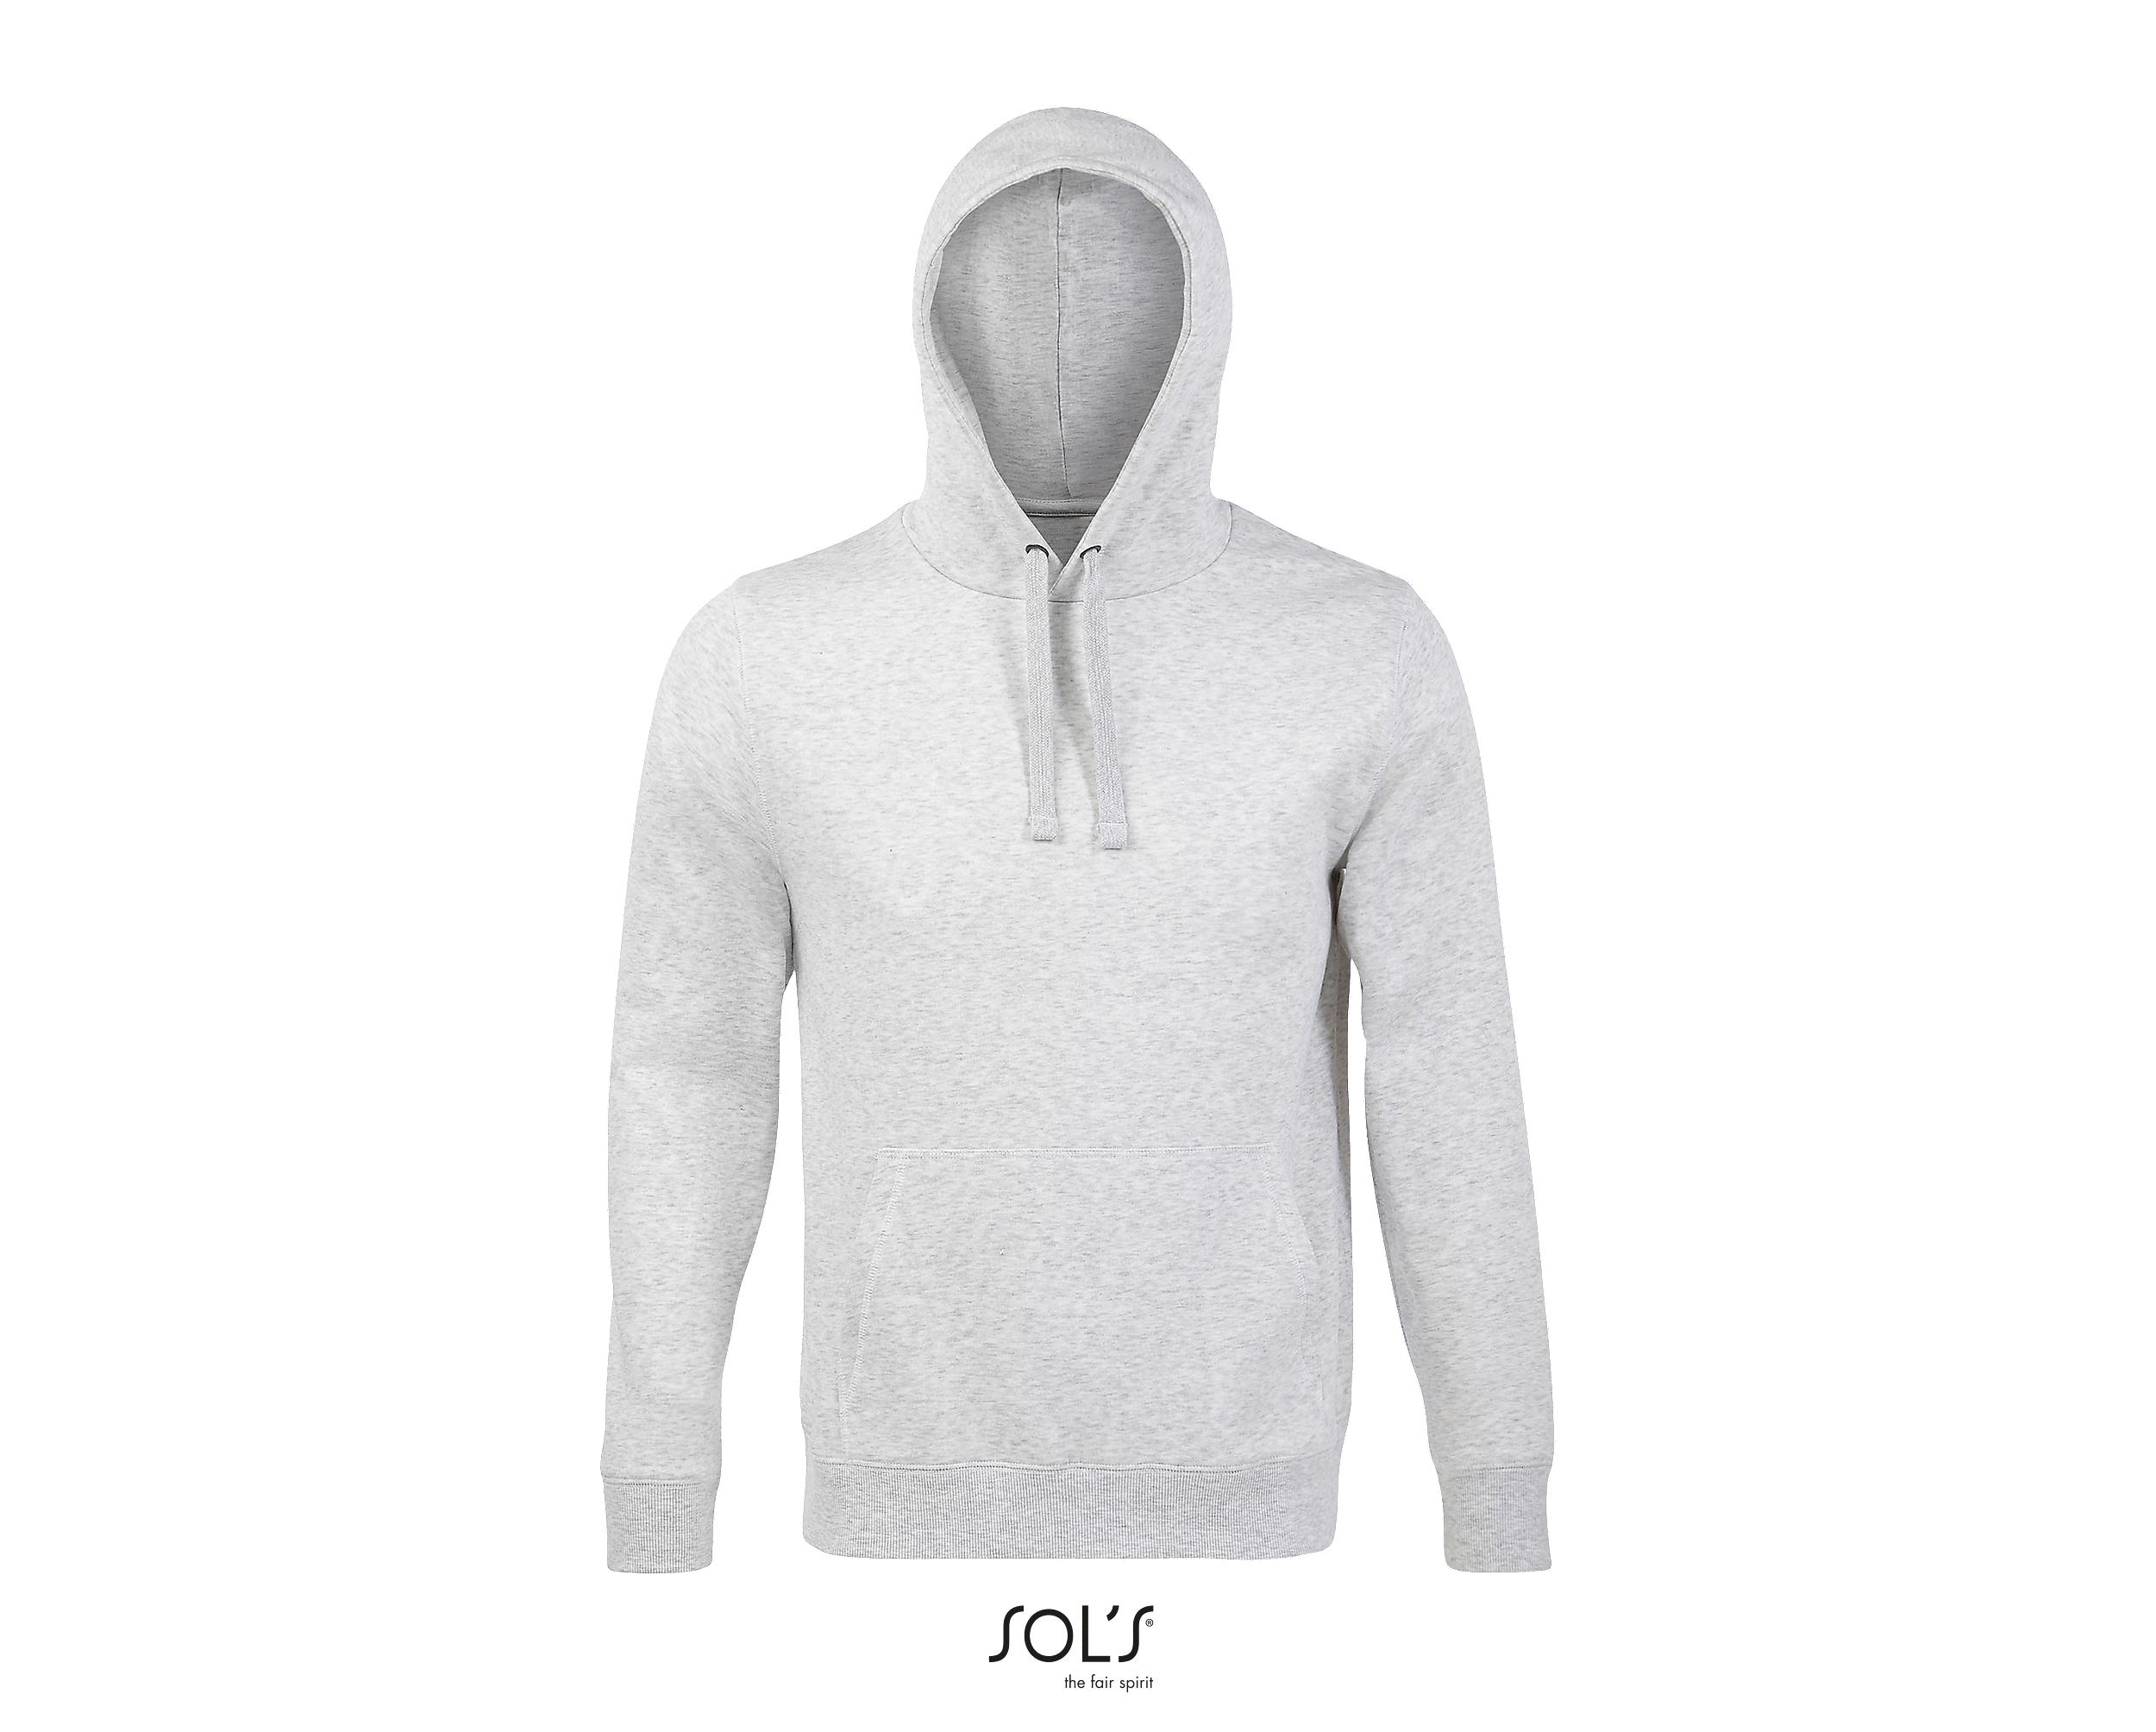 Sweat-shirt unisexe à capuche - 1-1403-14